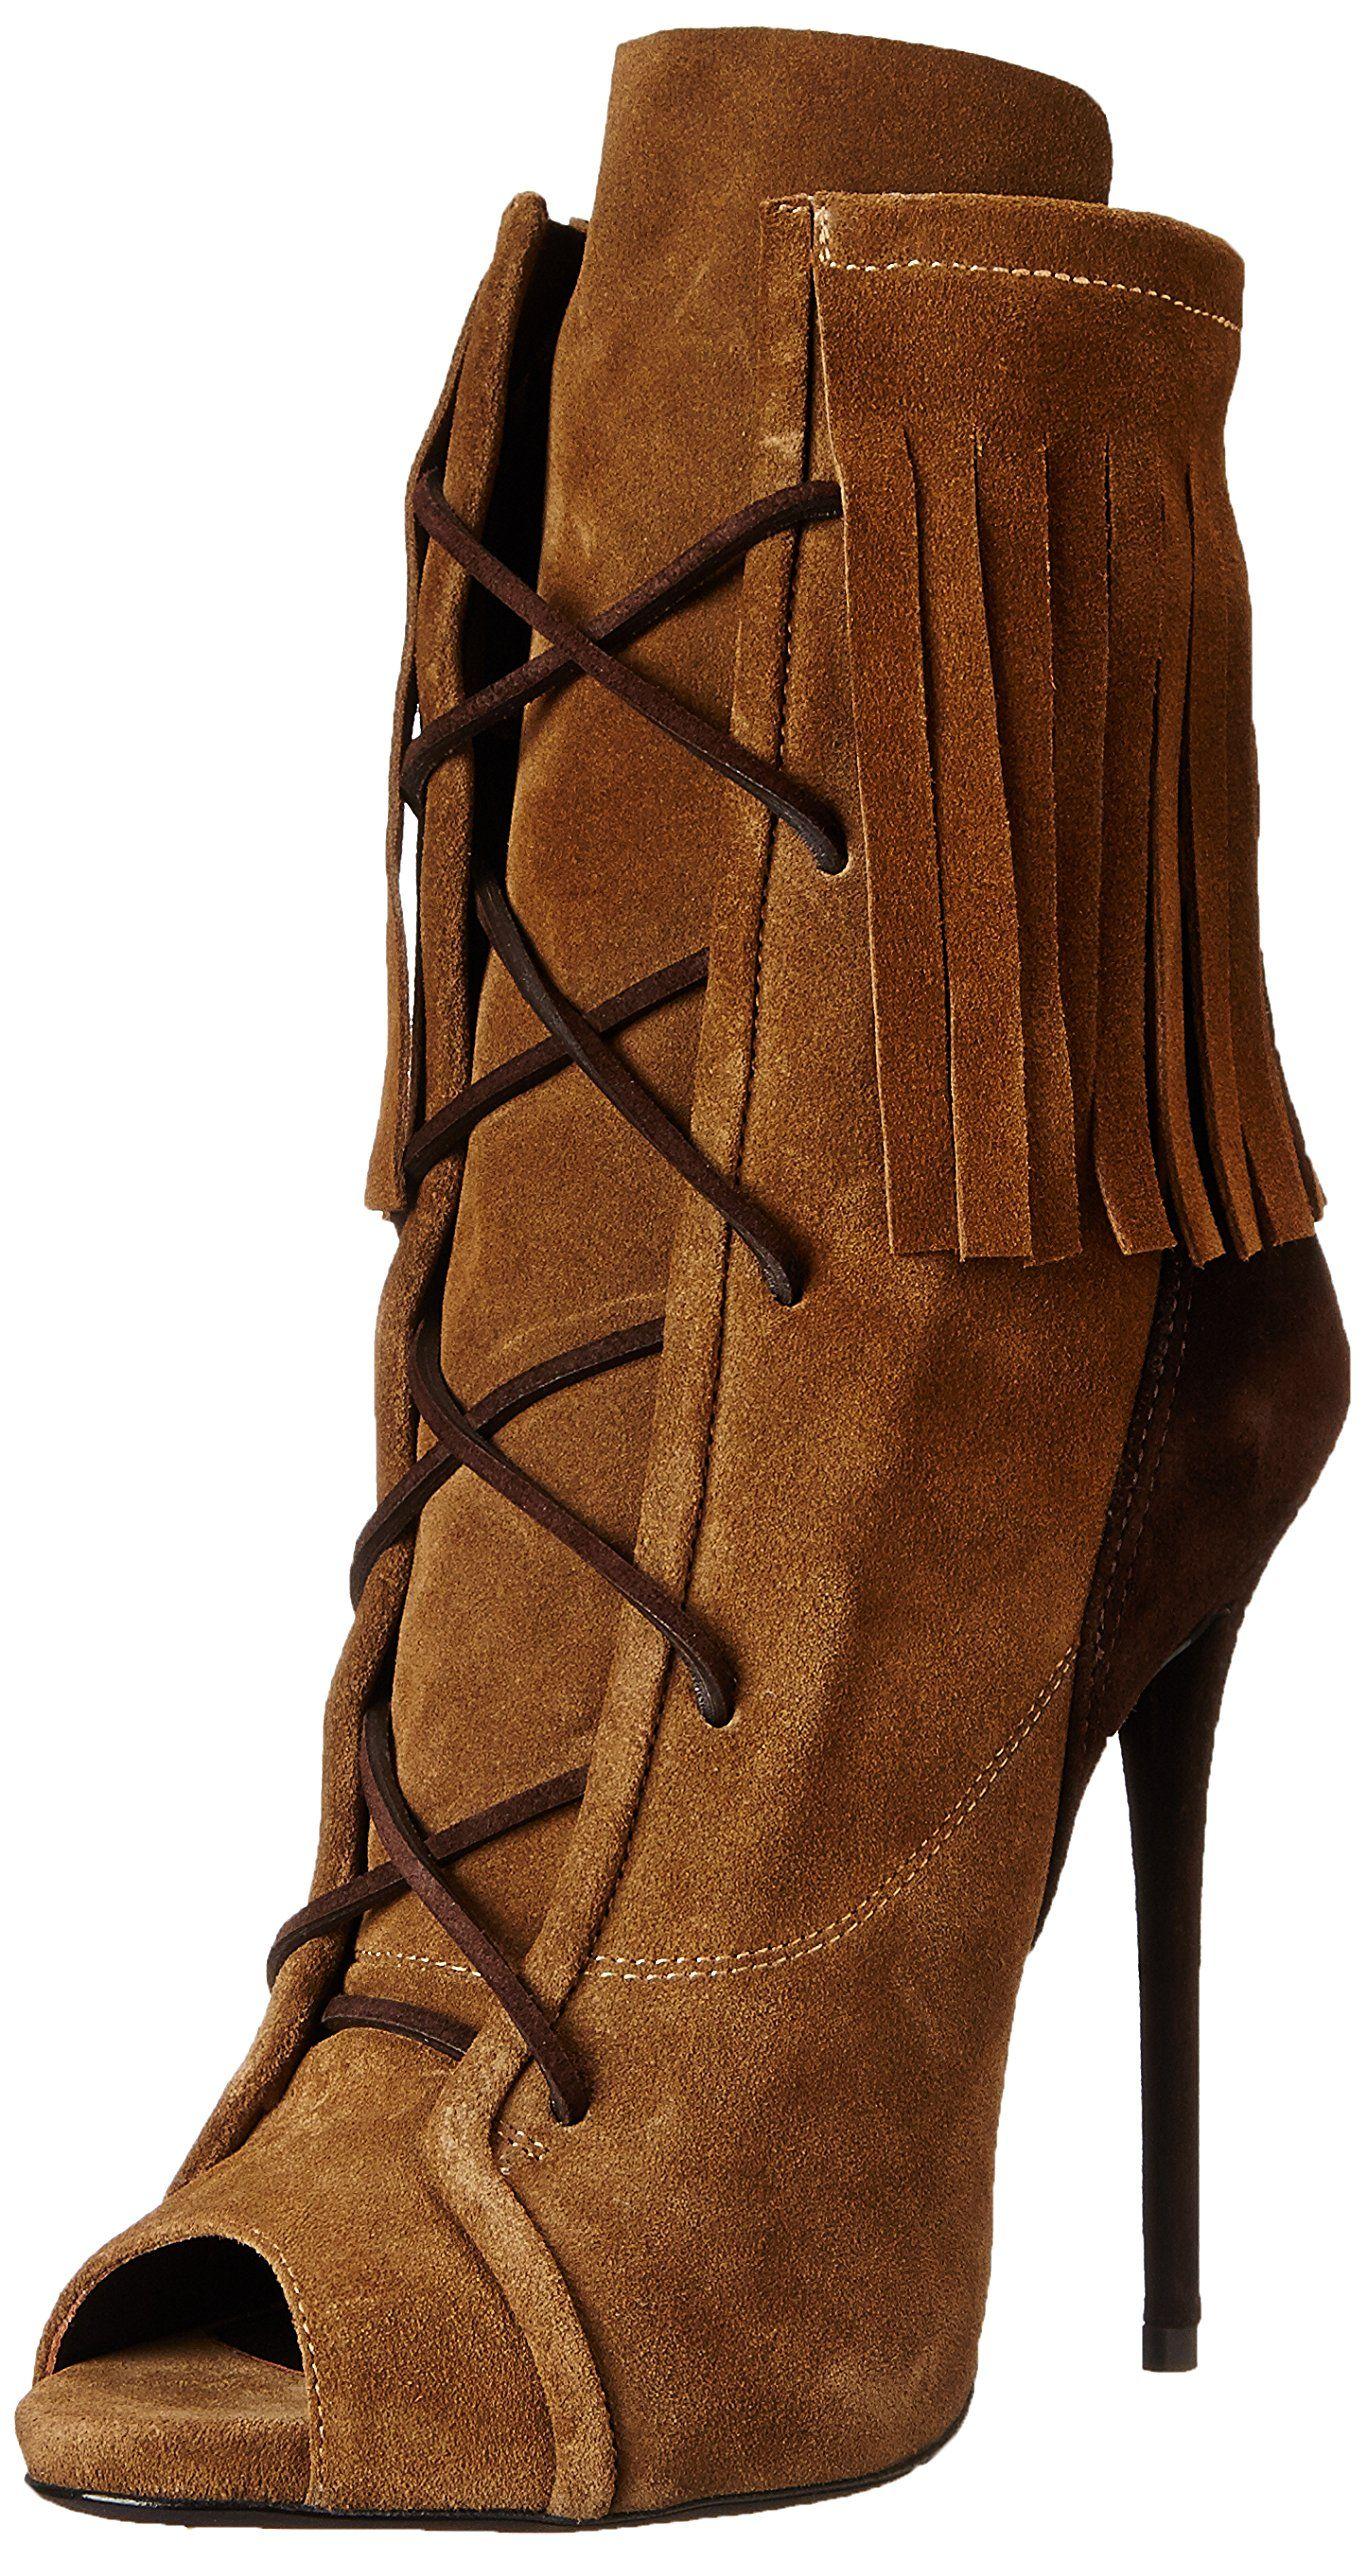 b2176c84a573b Giuseppe Zanotti Women's Boot, Velour Marmotta, 6 M US | Classic ...